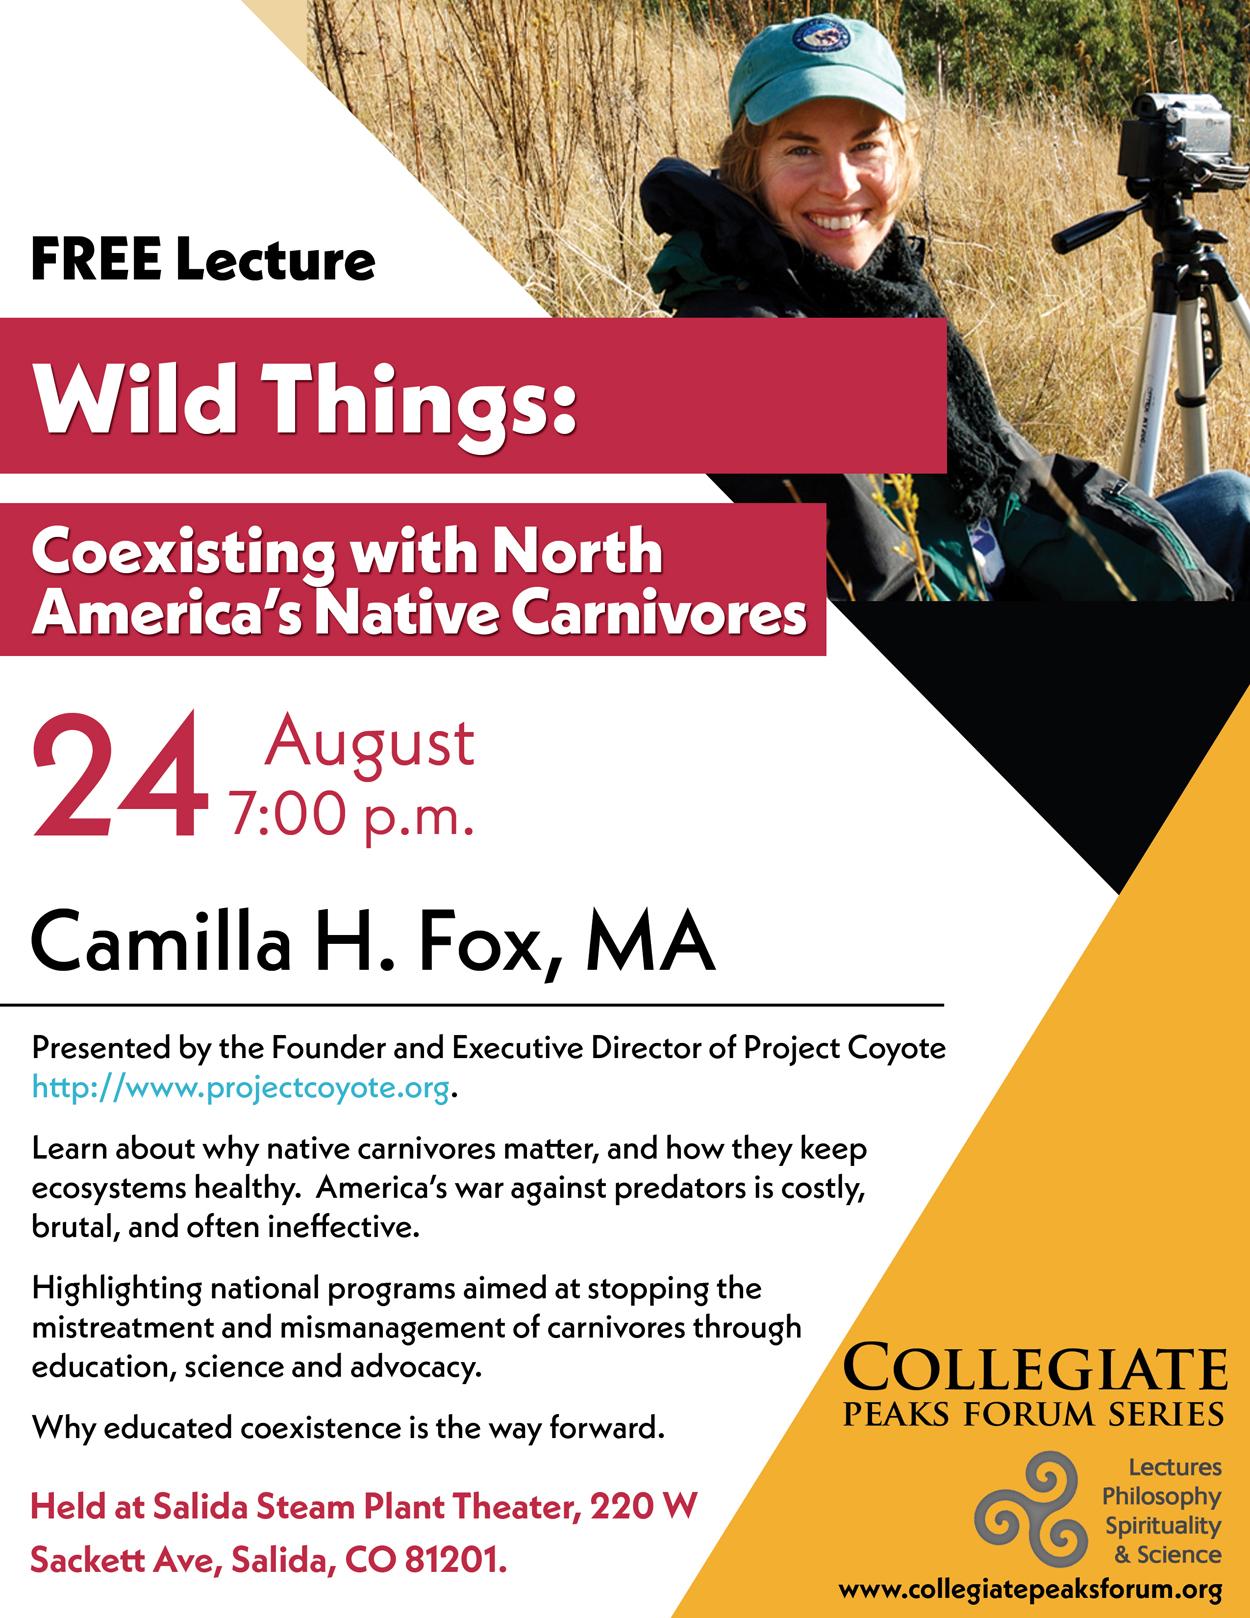 July 27, 2017 Camilla H. Fox, MA